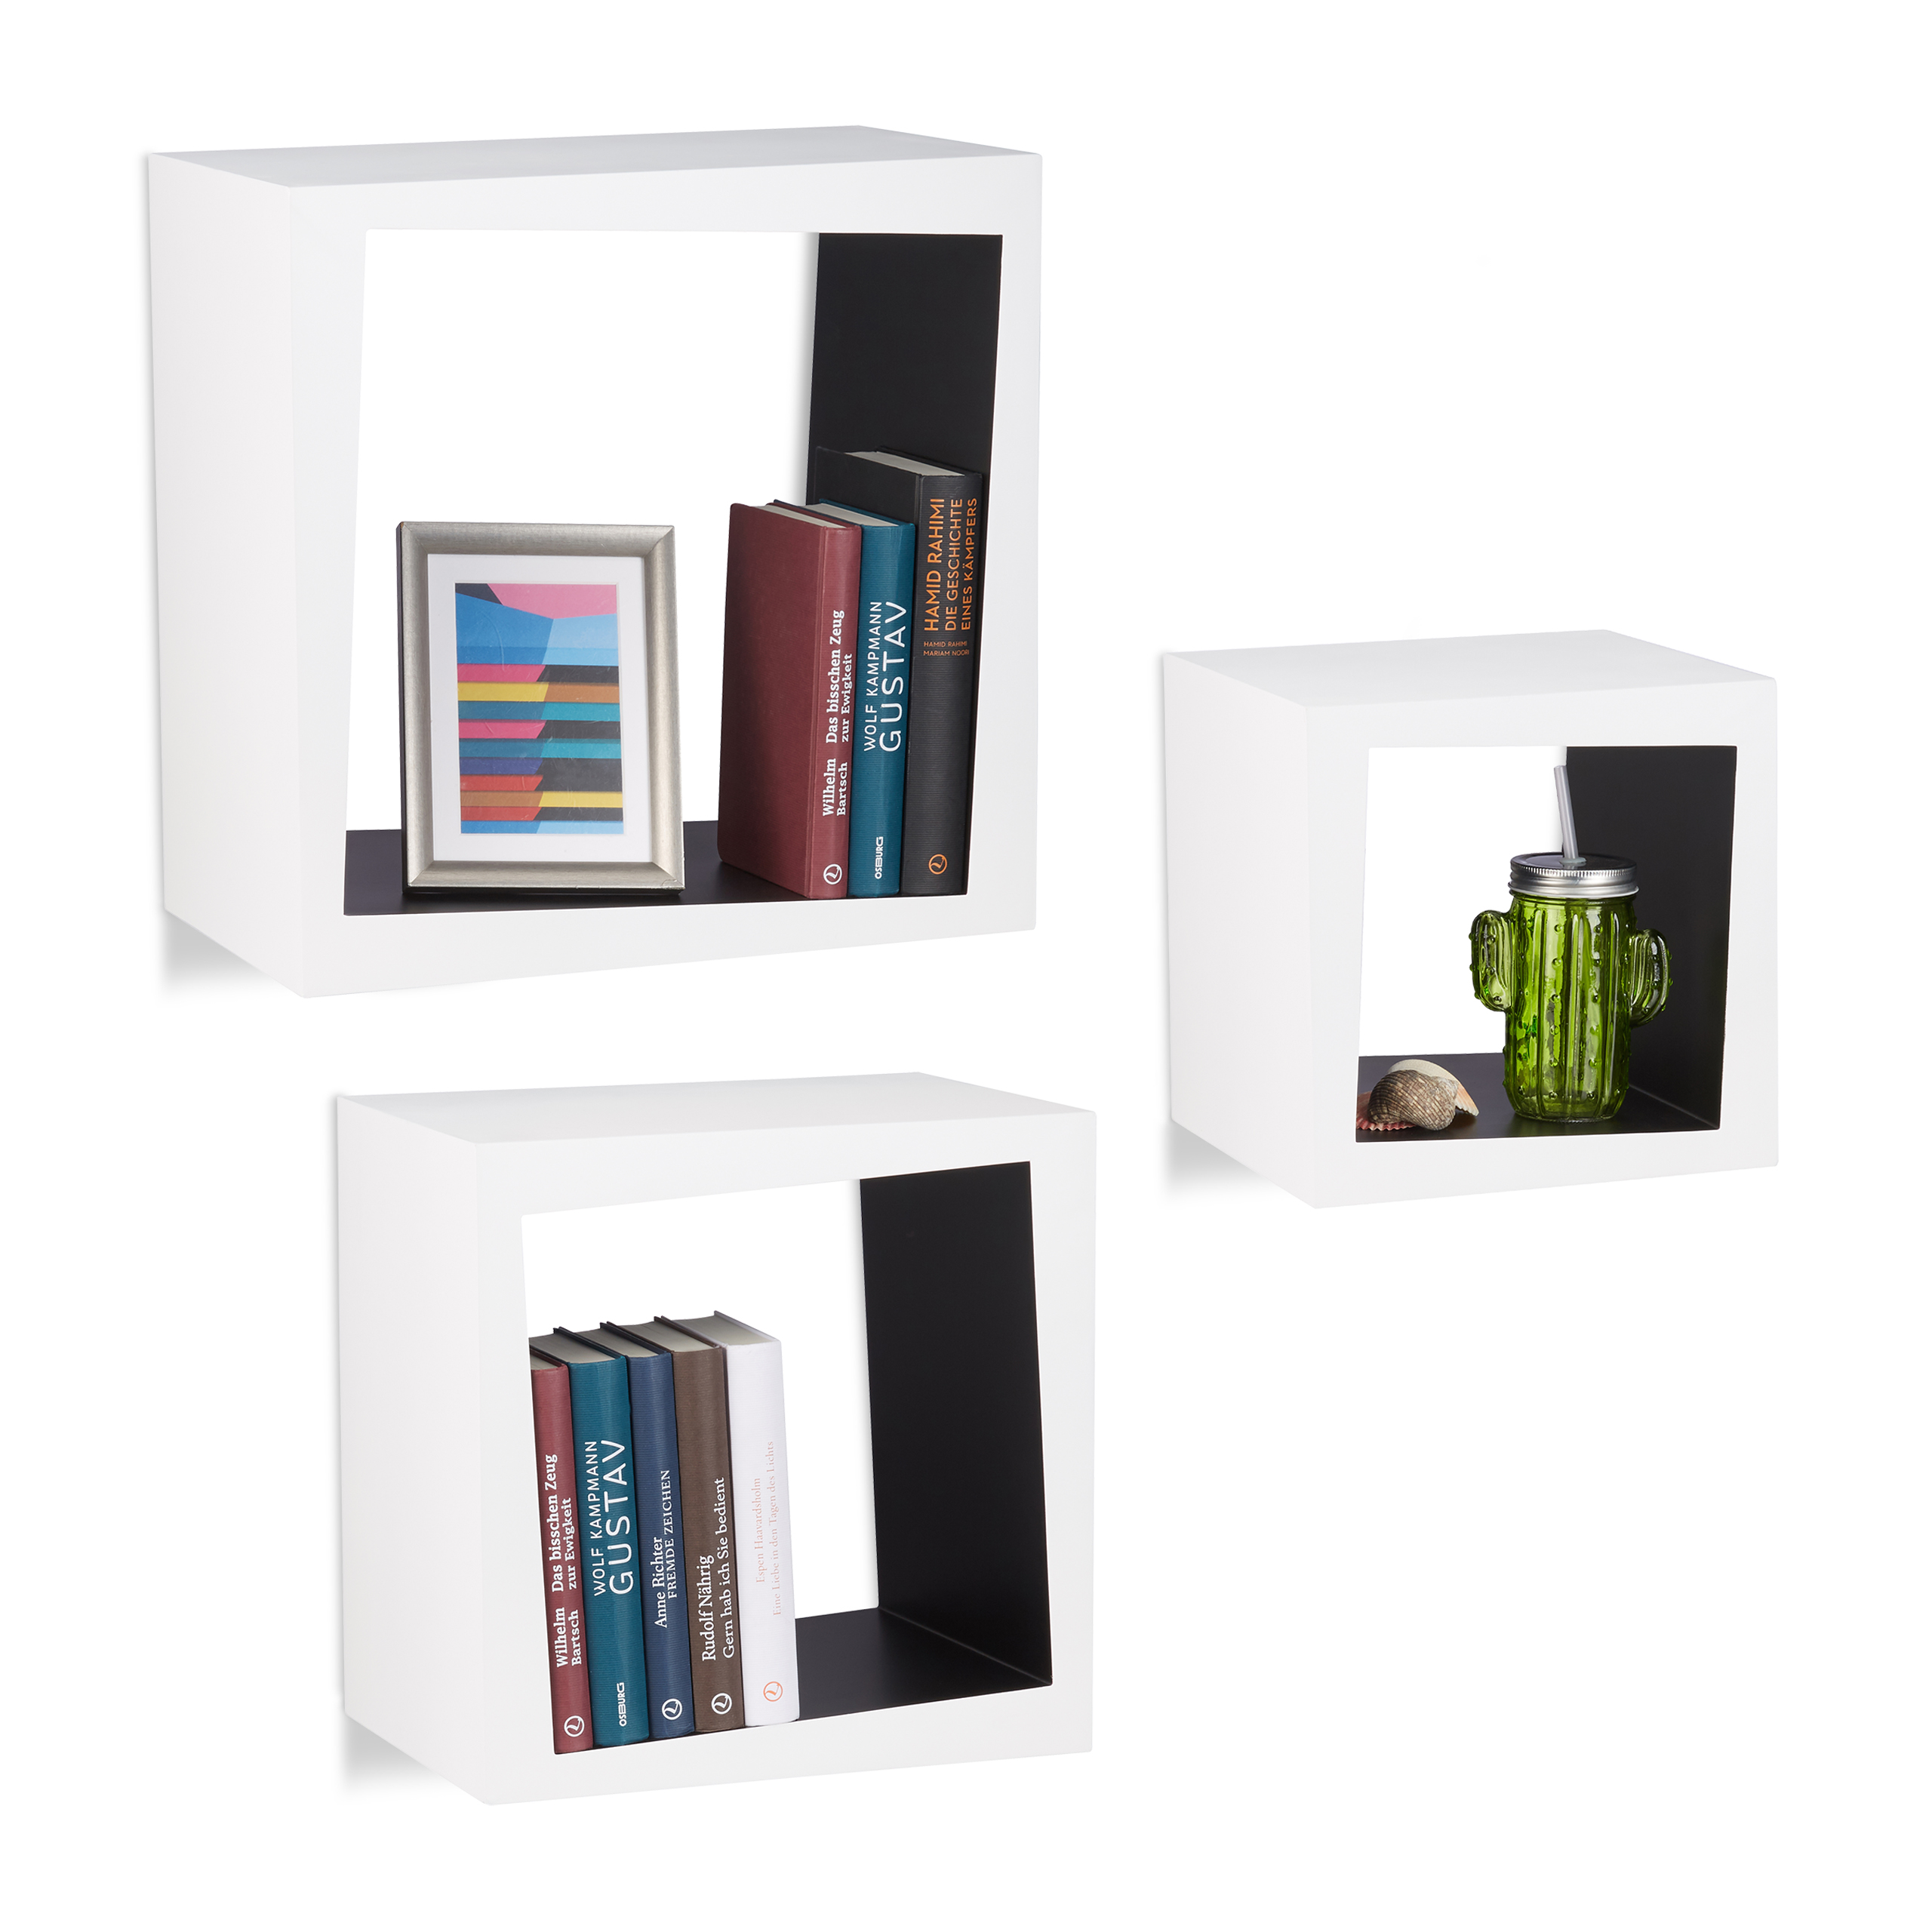 regal zum aufh ngen kinderzimmer cube 25 cm tiefe cd regal deko b cher mdf regal ebay. Black Bedroom Furniture Sets. Home Design Ideas